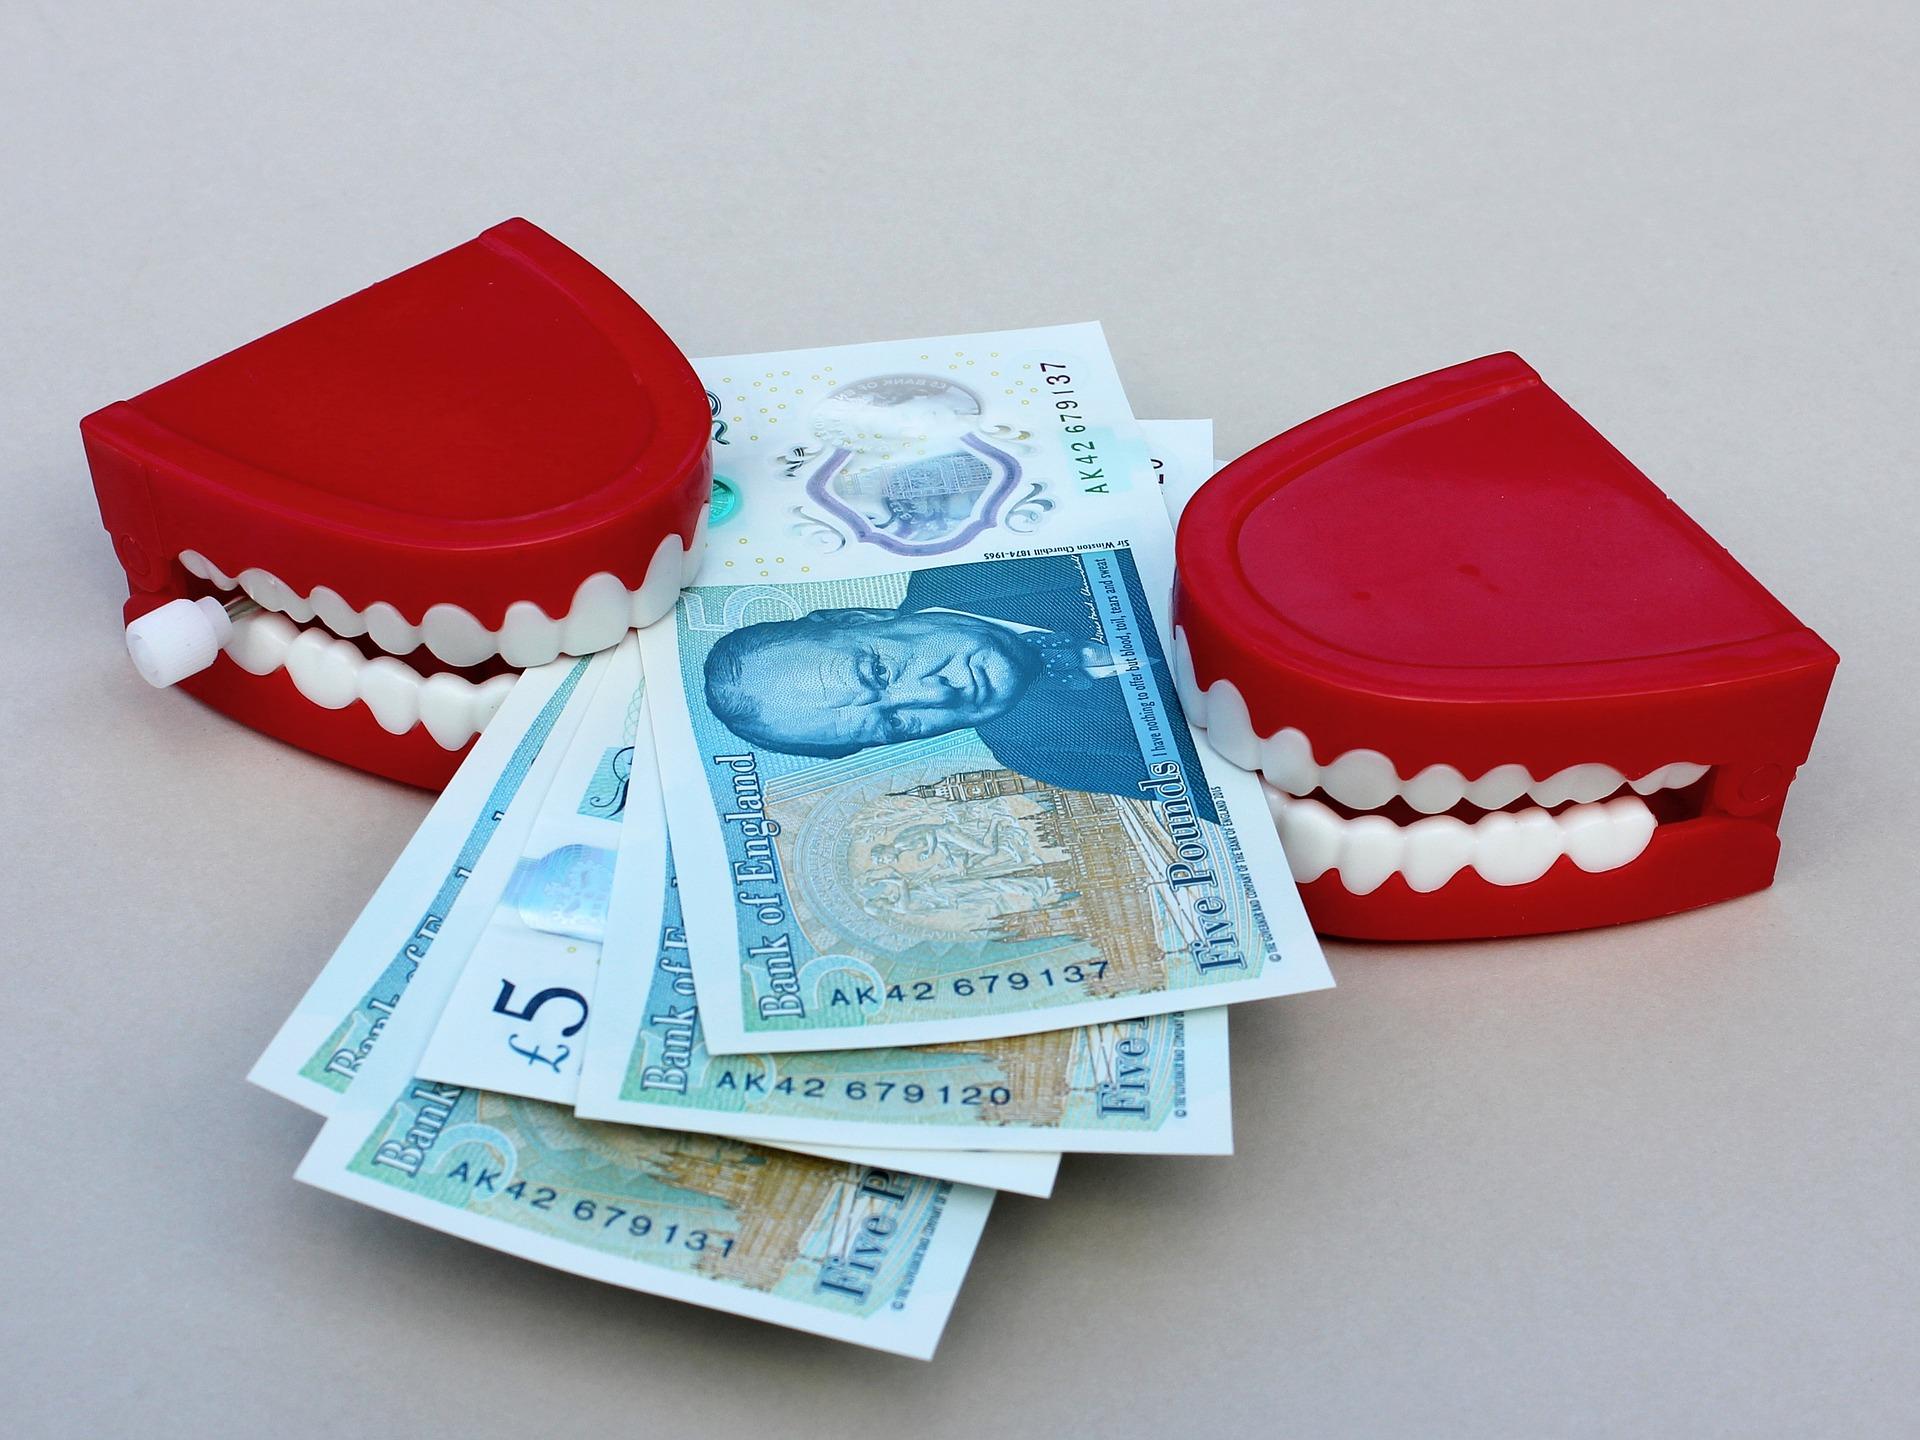 Ребусы класс, открытка деньги на зубы